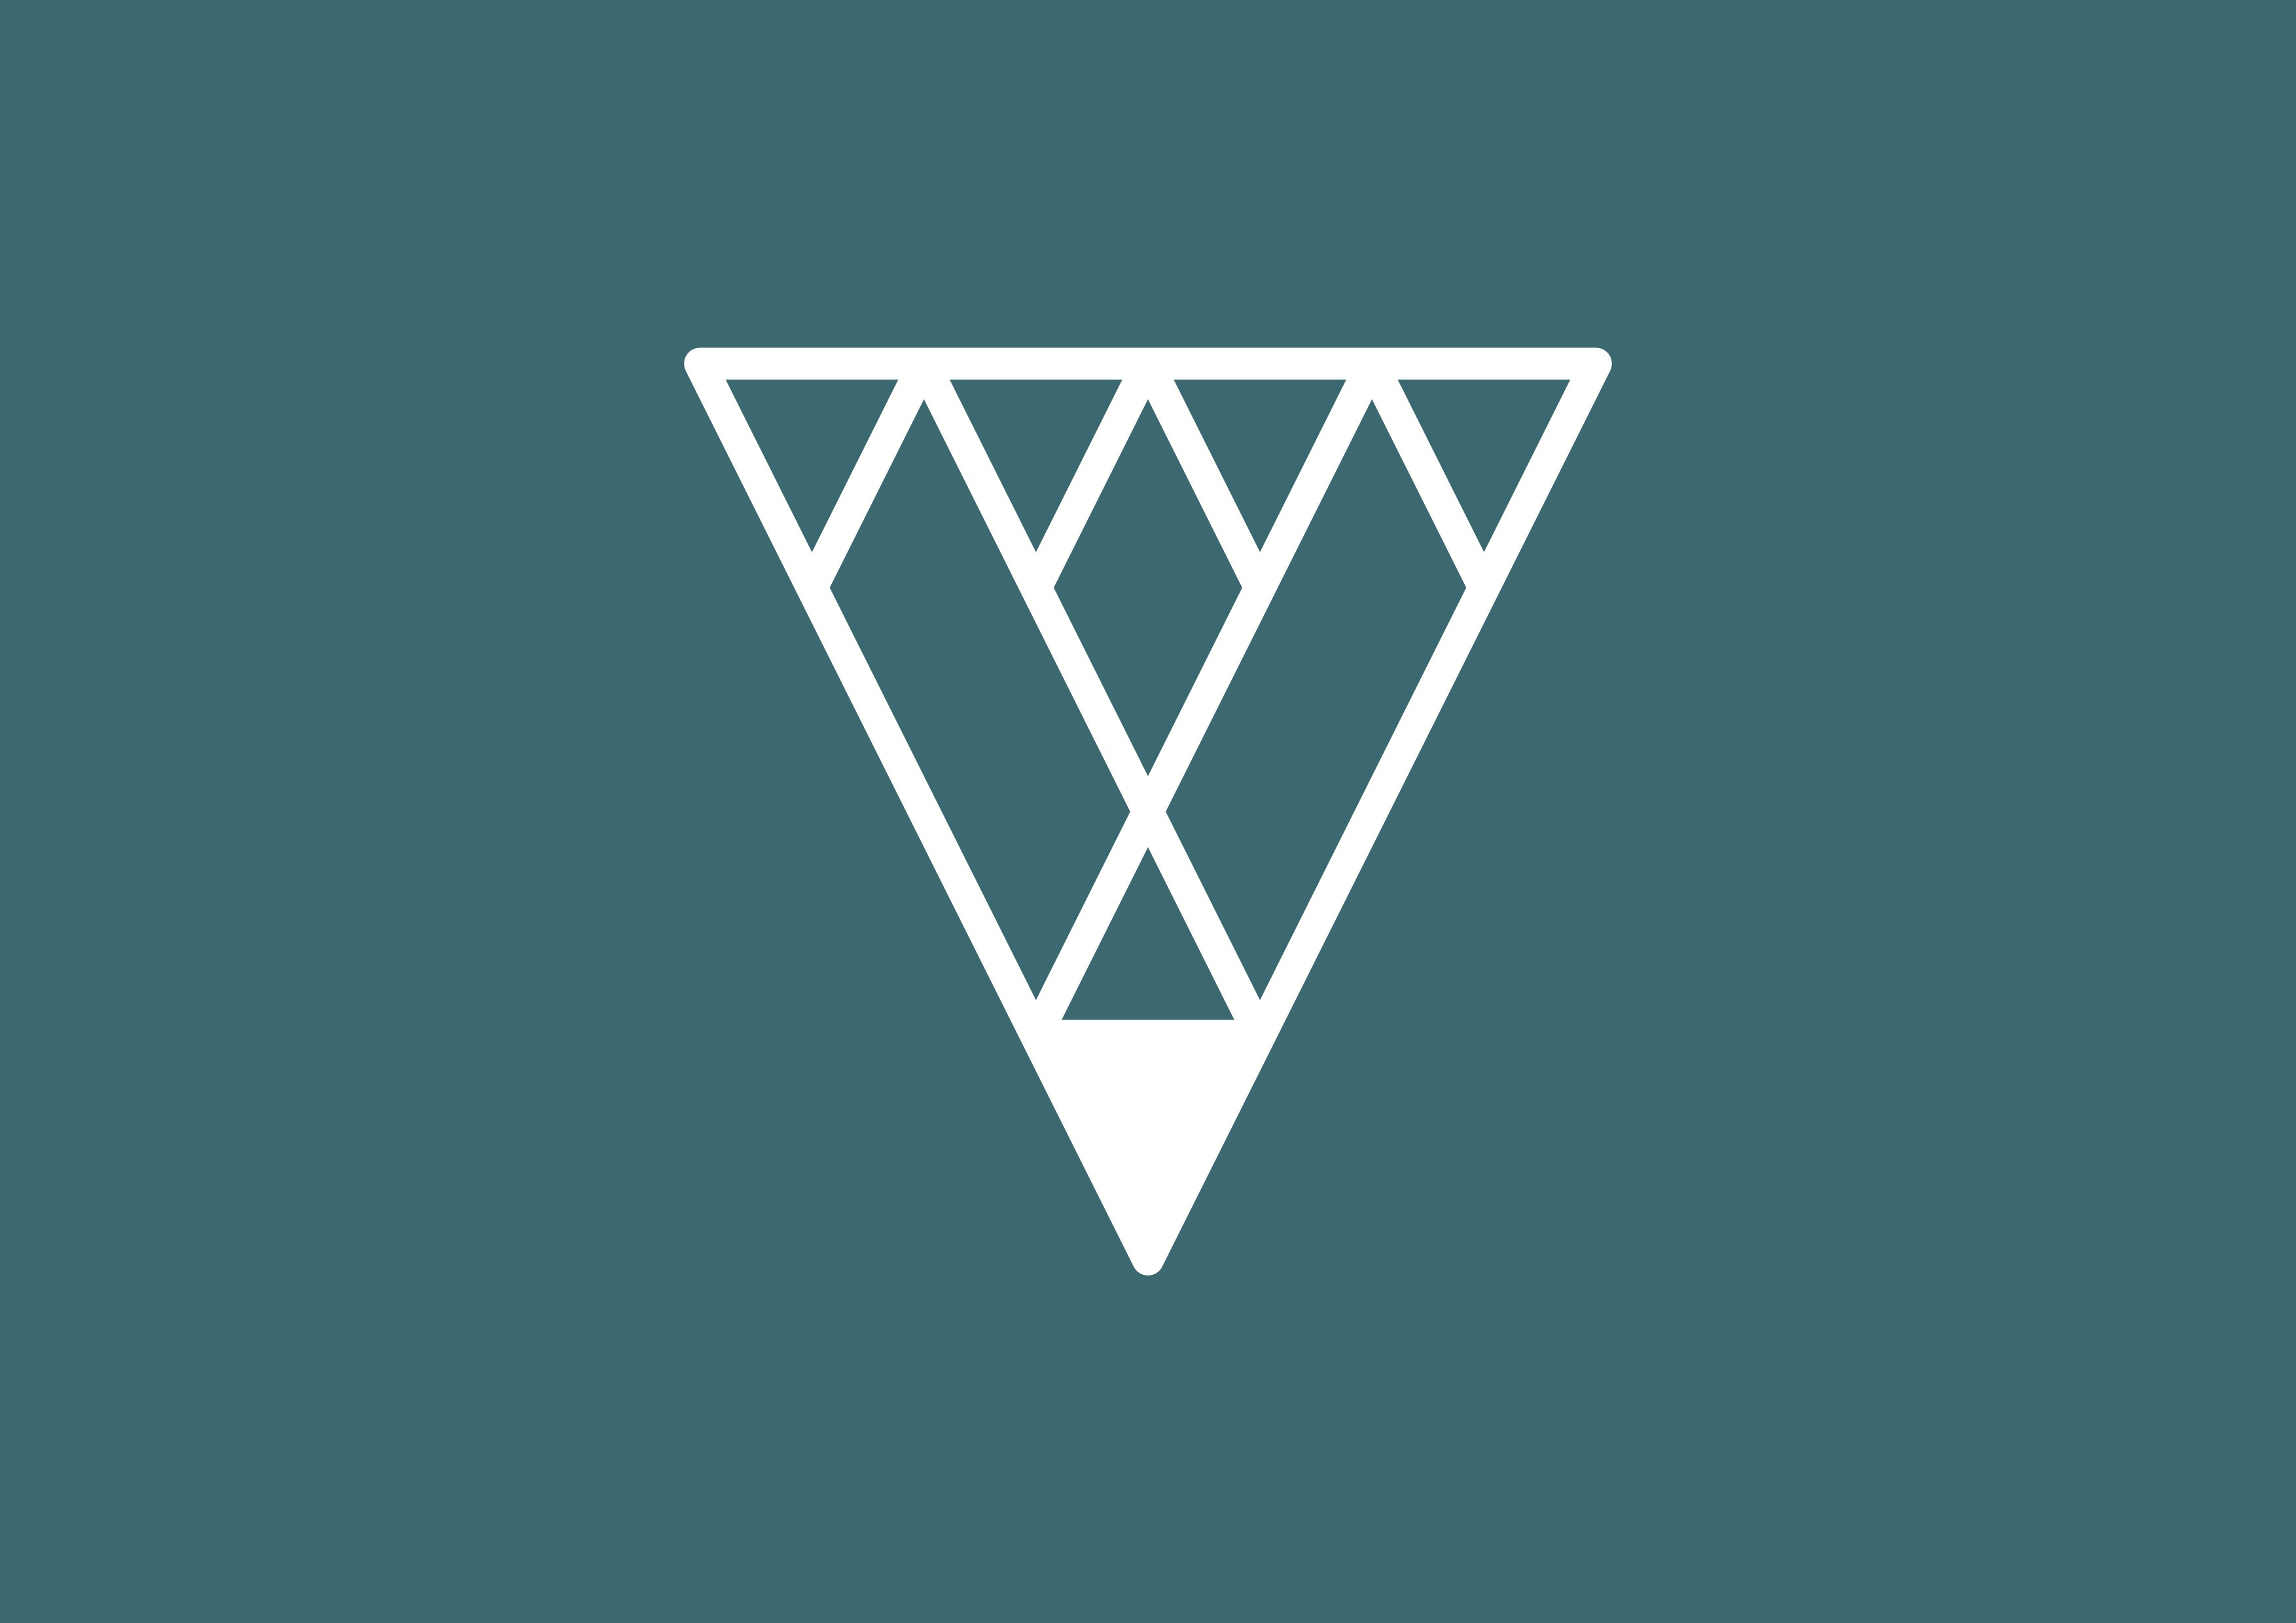 Design a minimalist logo for freelance writer / website designer